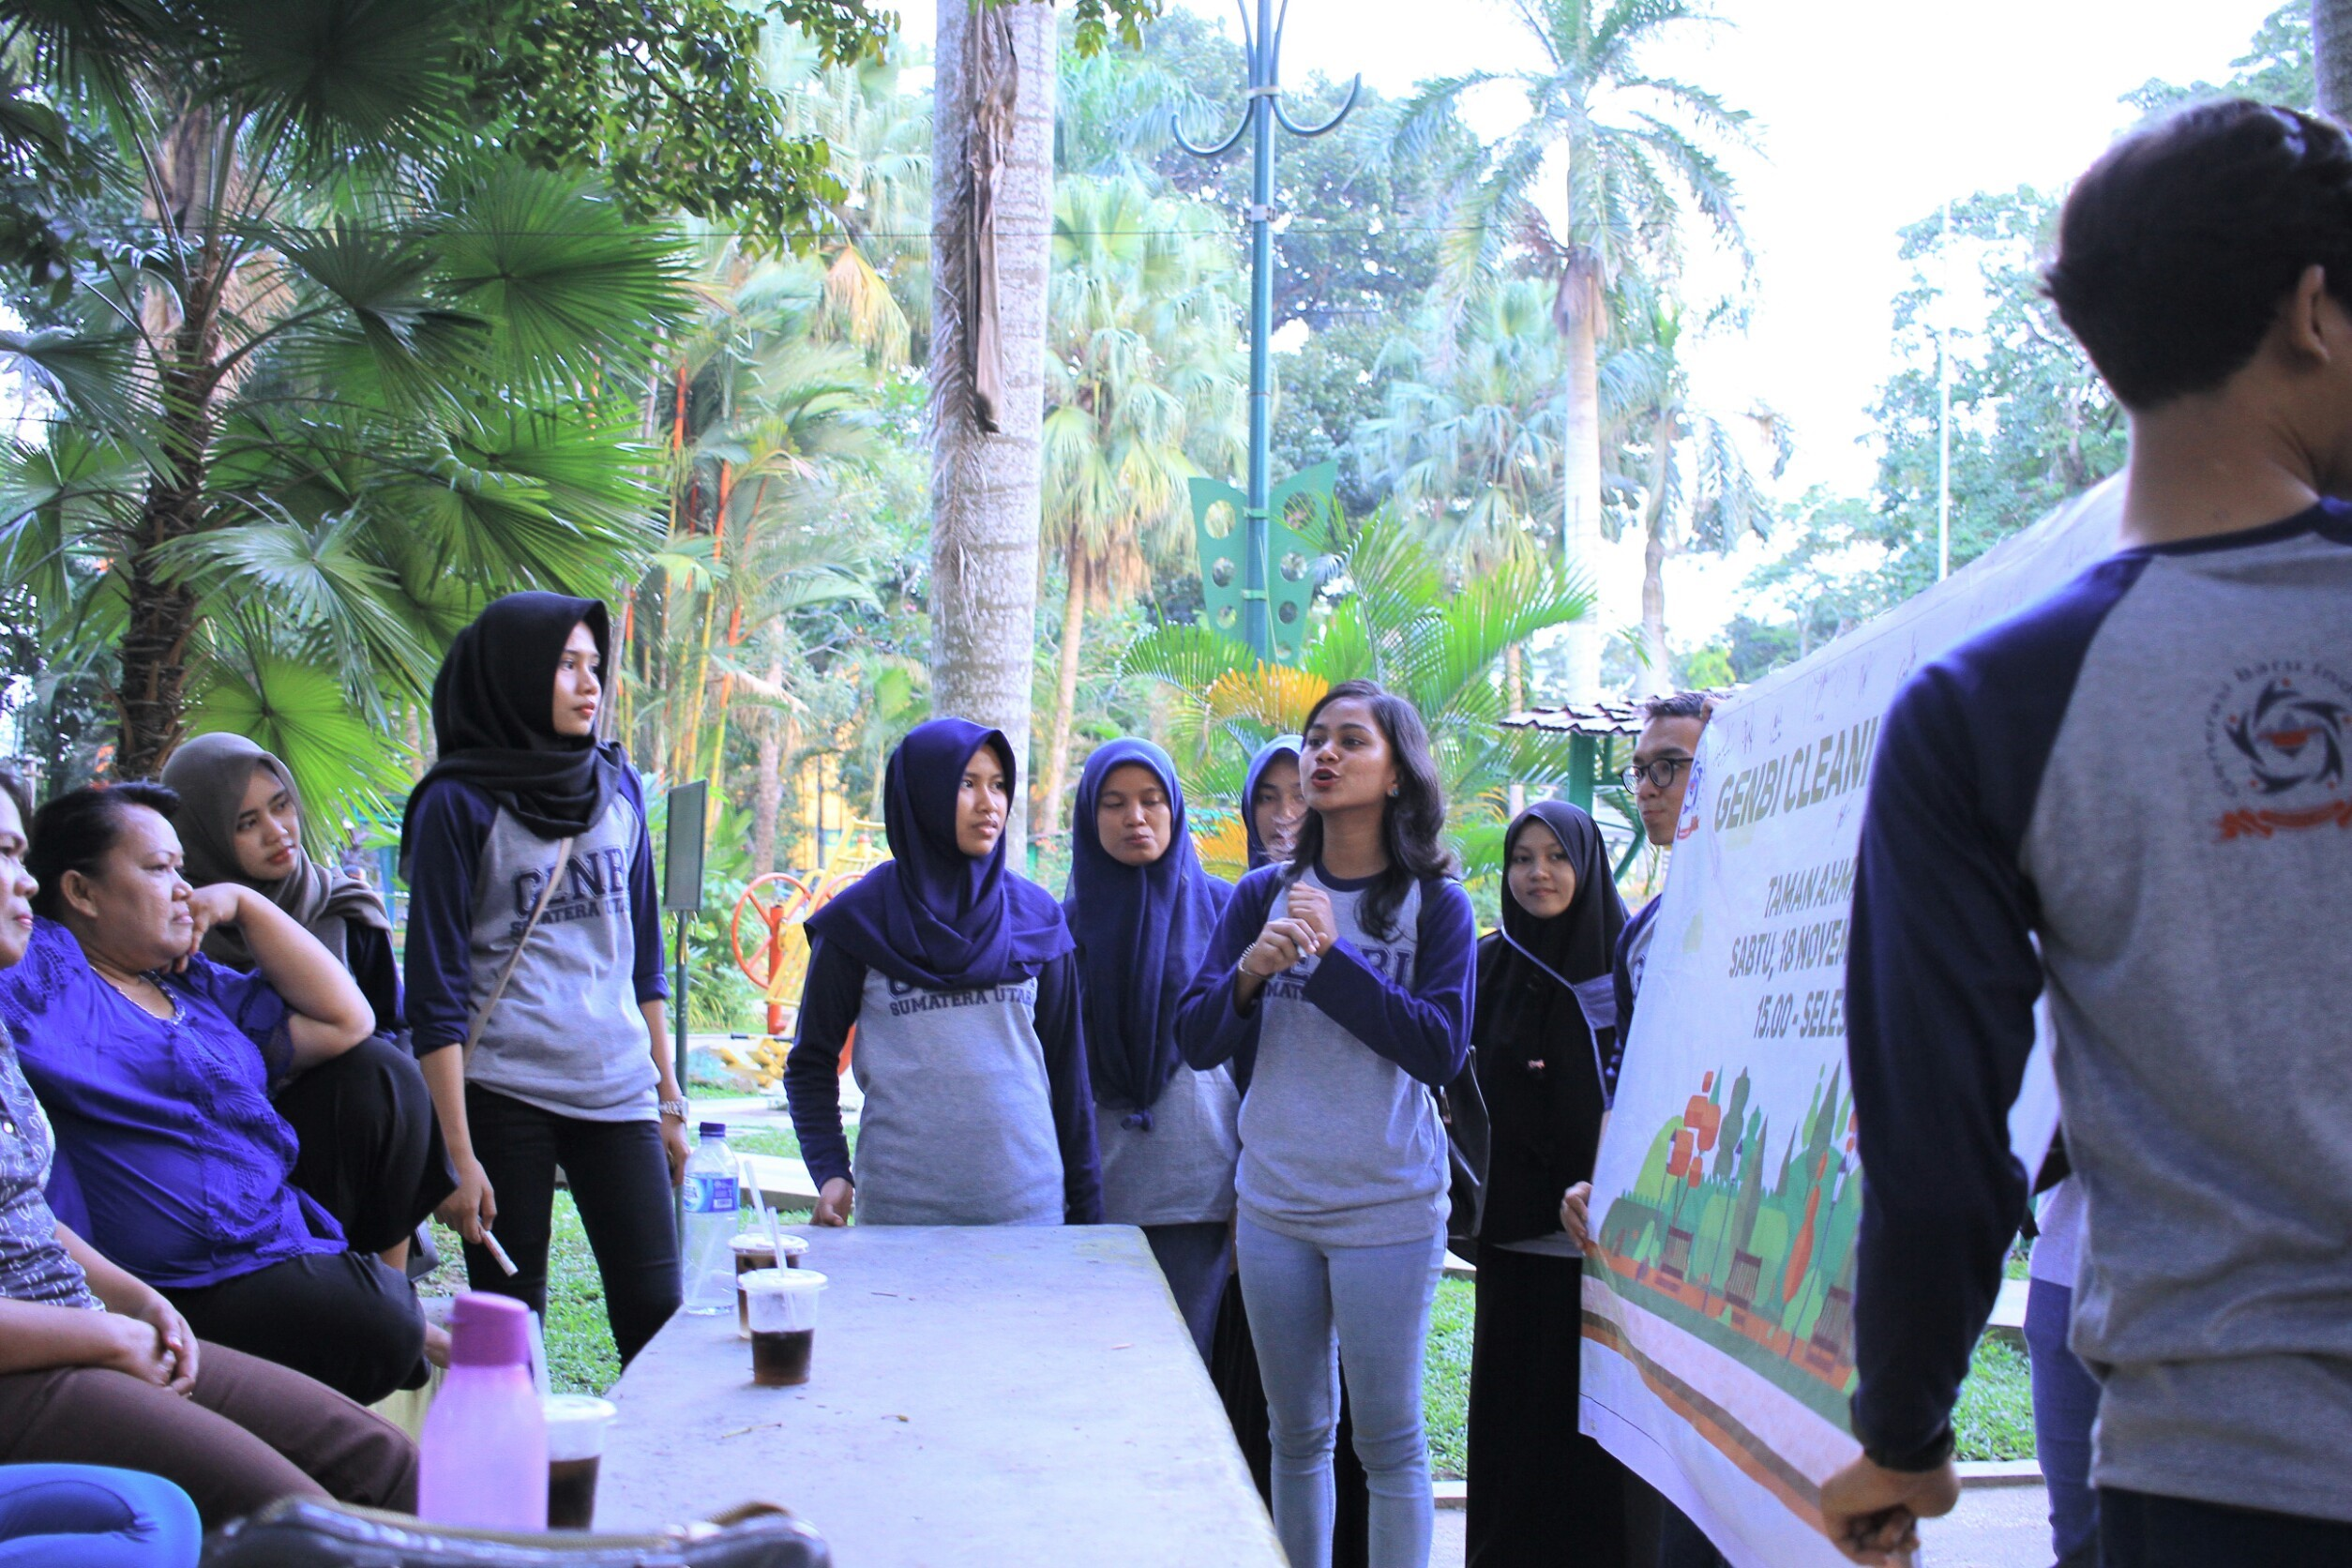 Cleaning Project : Shitaaram yang sedang melakukan aksi sosial menggalakkan pentingnya kebersihan pada acara Cleaning Project GenBI USU. (Sumber: Narasumber)